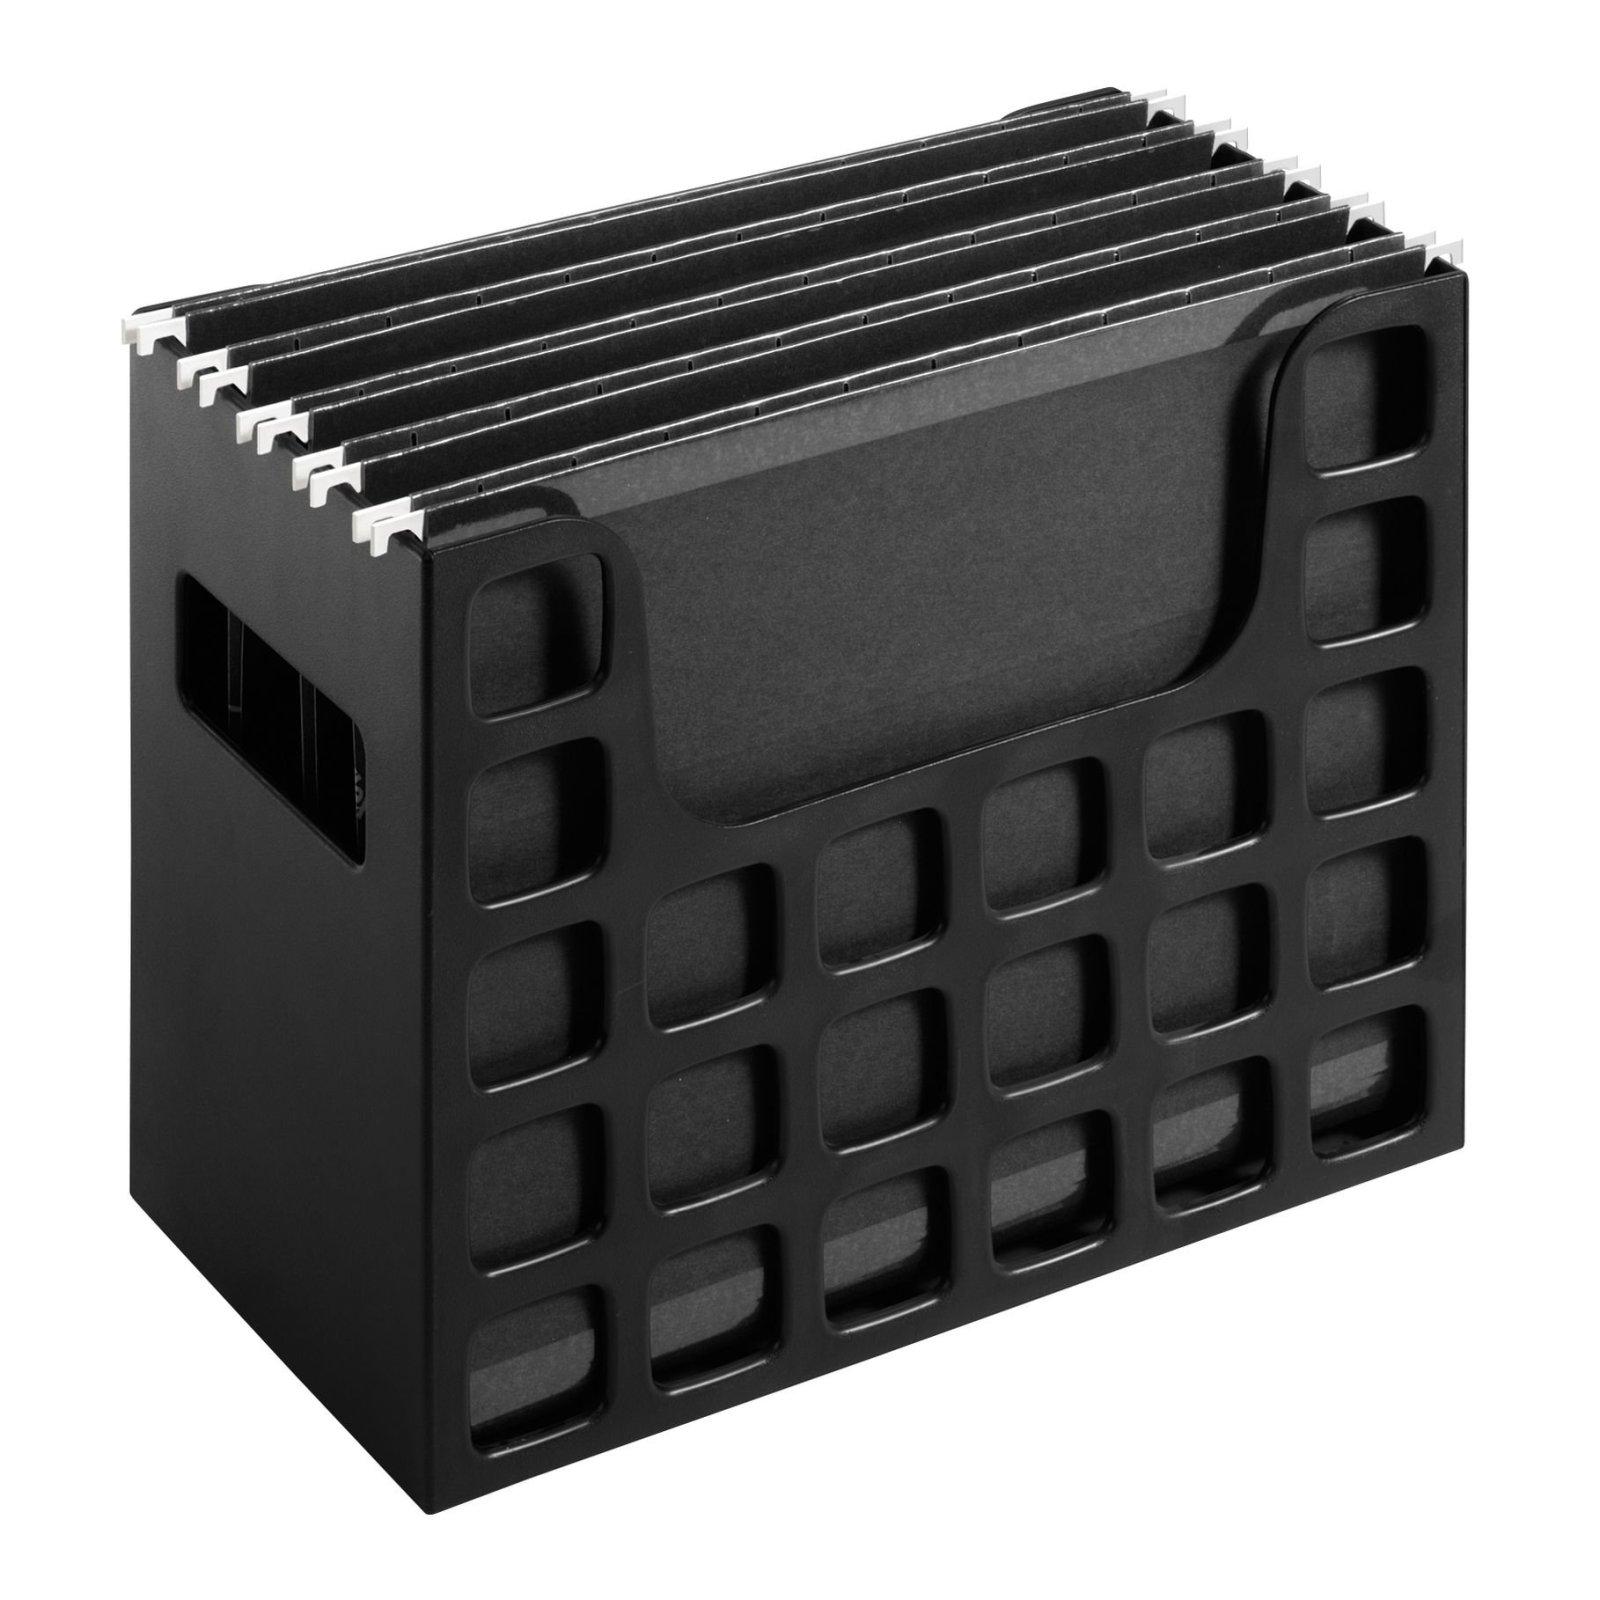 Desktop File Box Hanging Folder Organizer Storage Rack Document